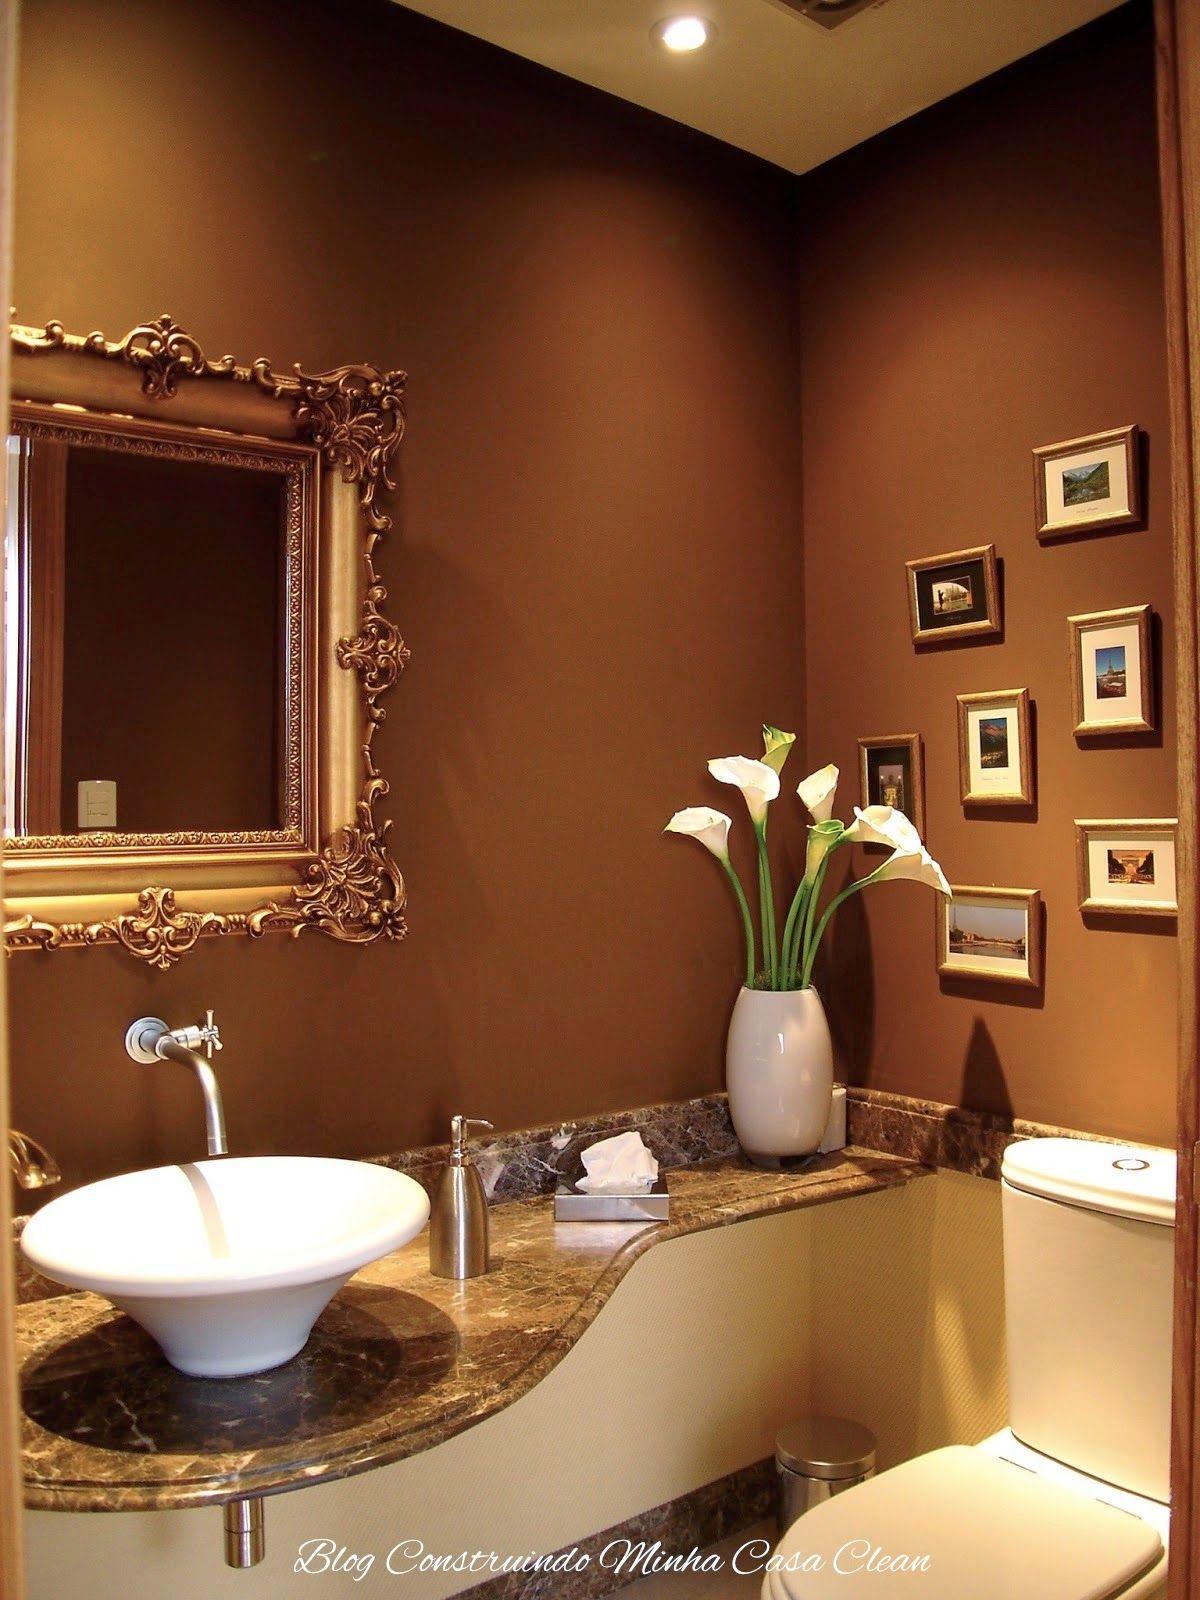 55 lavabos de luxo pequenos e sofisticados moldes for Muebles encantadores del pais elegante